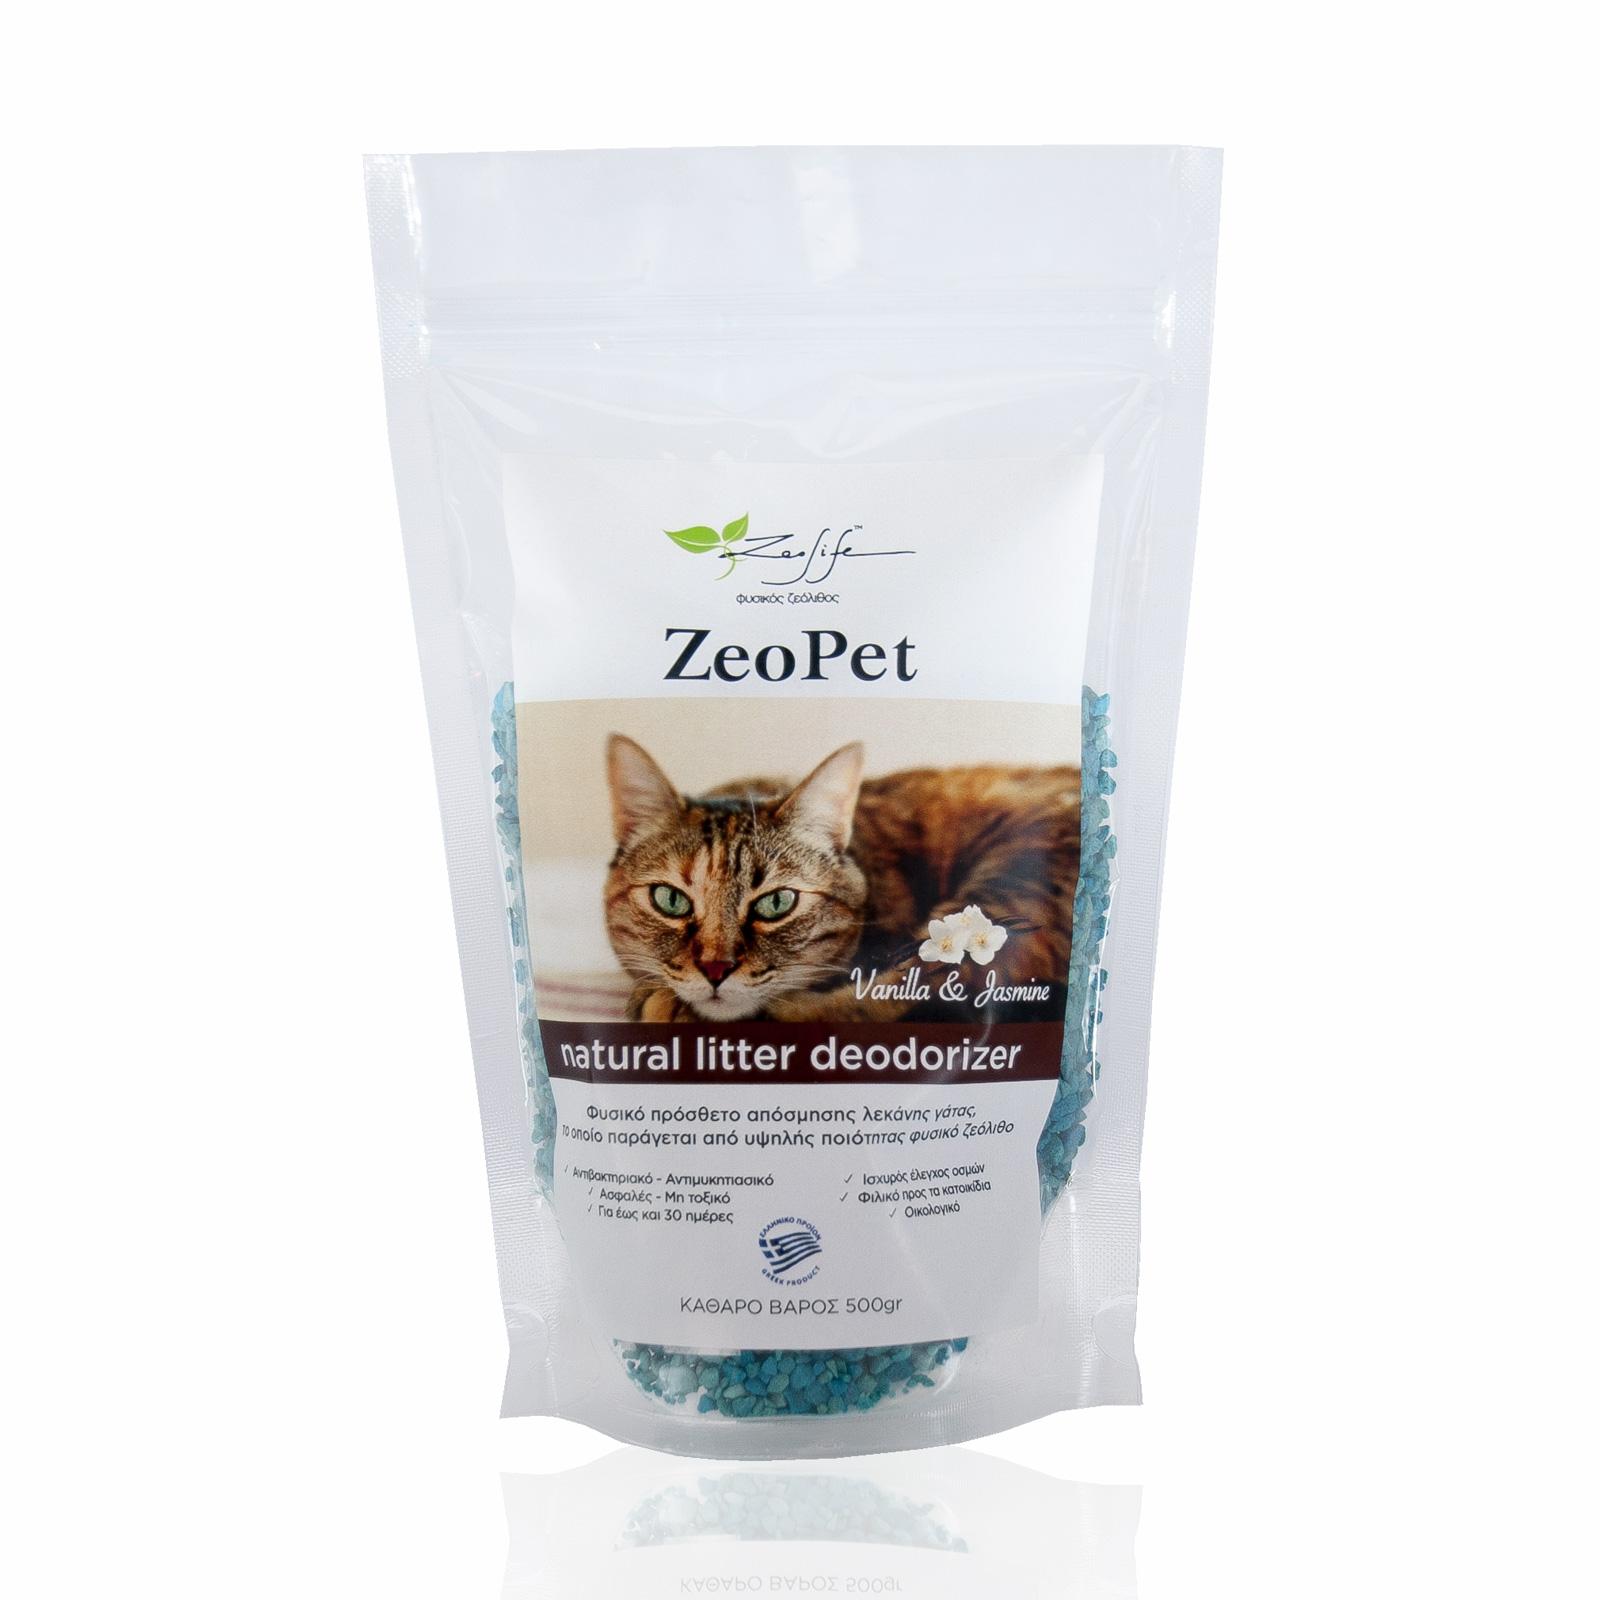 ZeoPet – Φυσικό πρόσθετο απόσμησης λεκάνης γάτας για 30 ημέρες